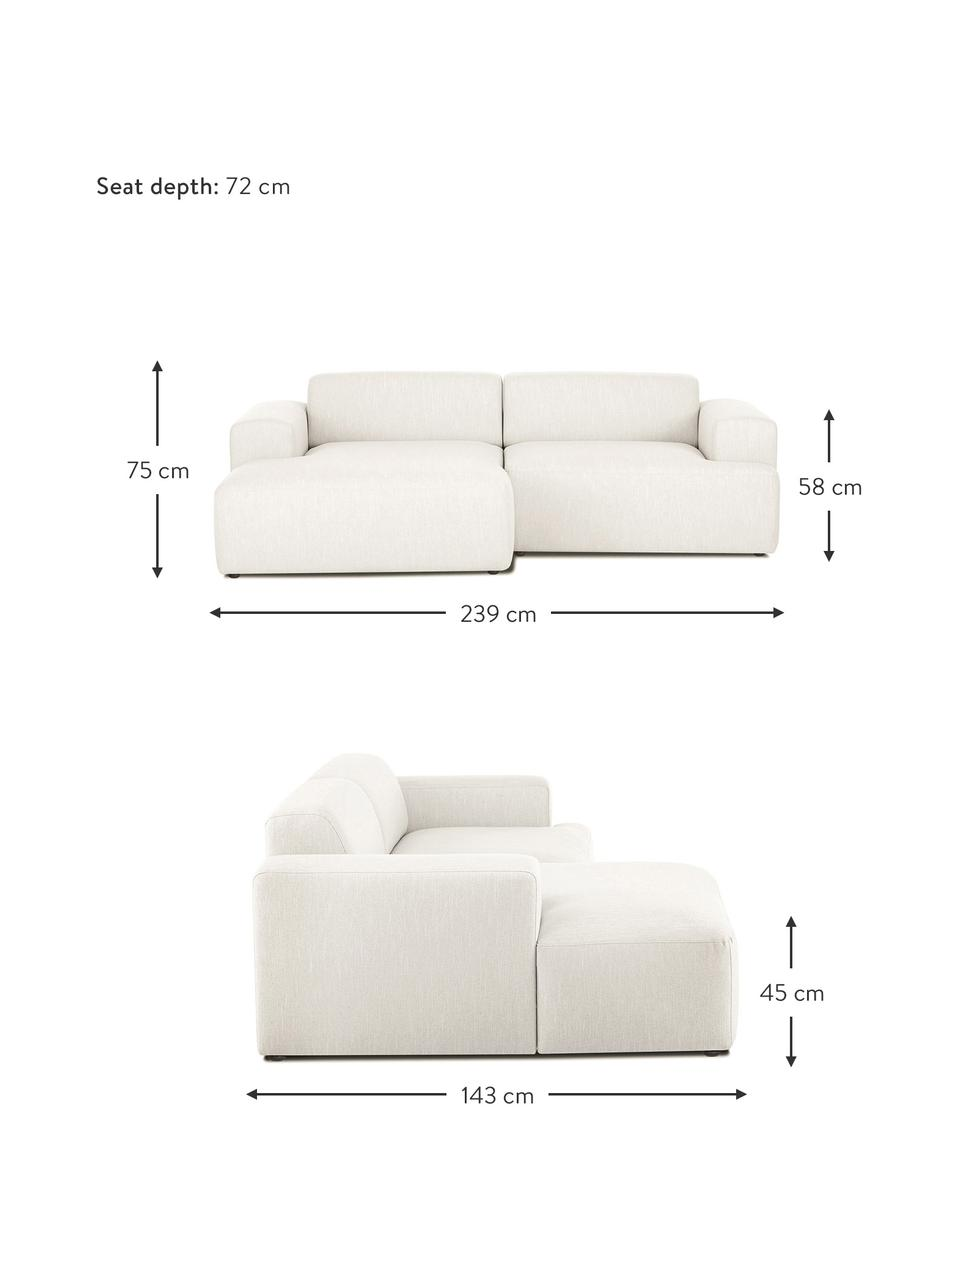 Hoekbank Melva (3-zits) in beige, Bekleding: 100% polyester, Frame: massief grenenhout, FSC-g, Poten: kunststof, Geweven stof beige, B 239 x D 143 cm